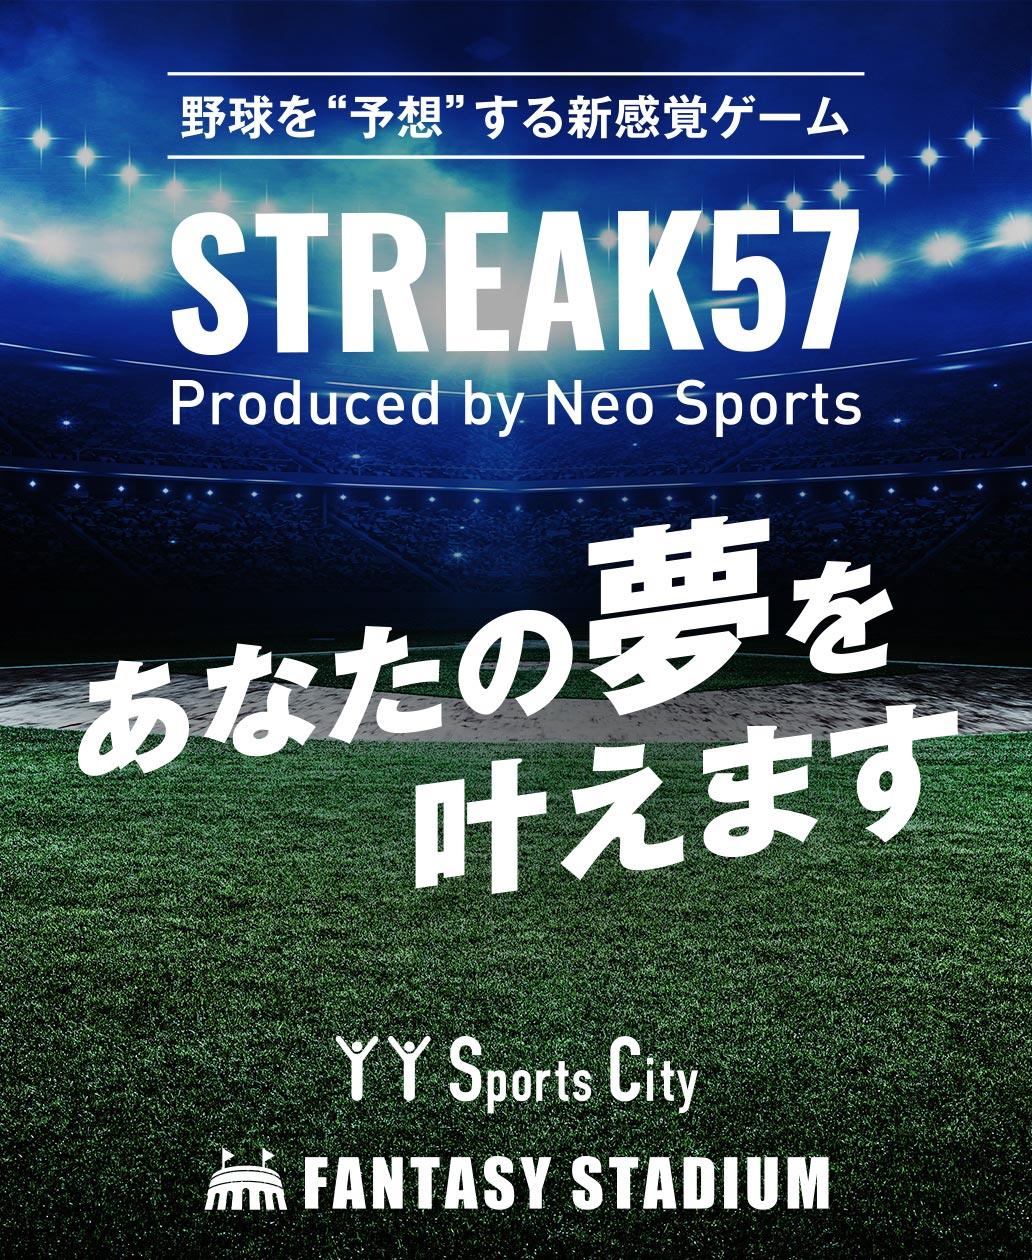 STREAK57の画像まとめ 画像